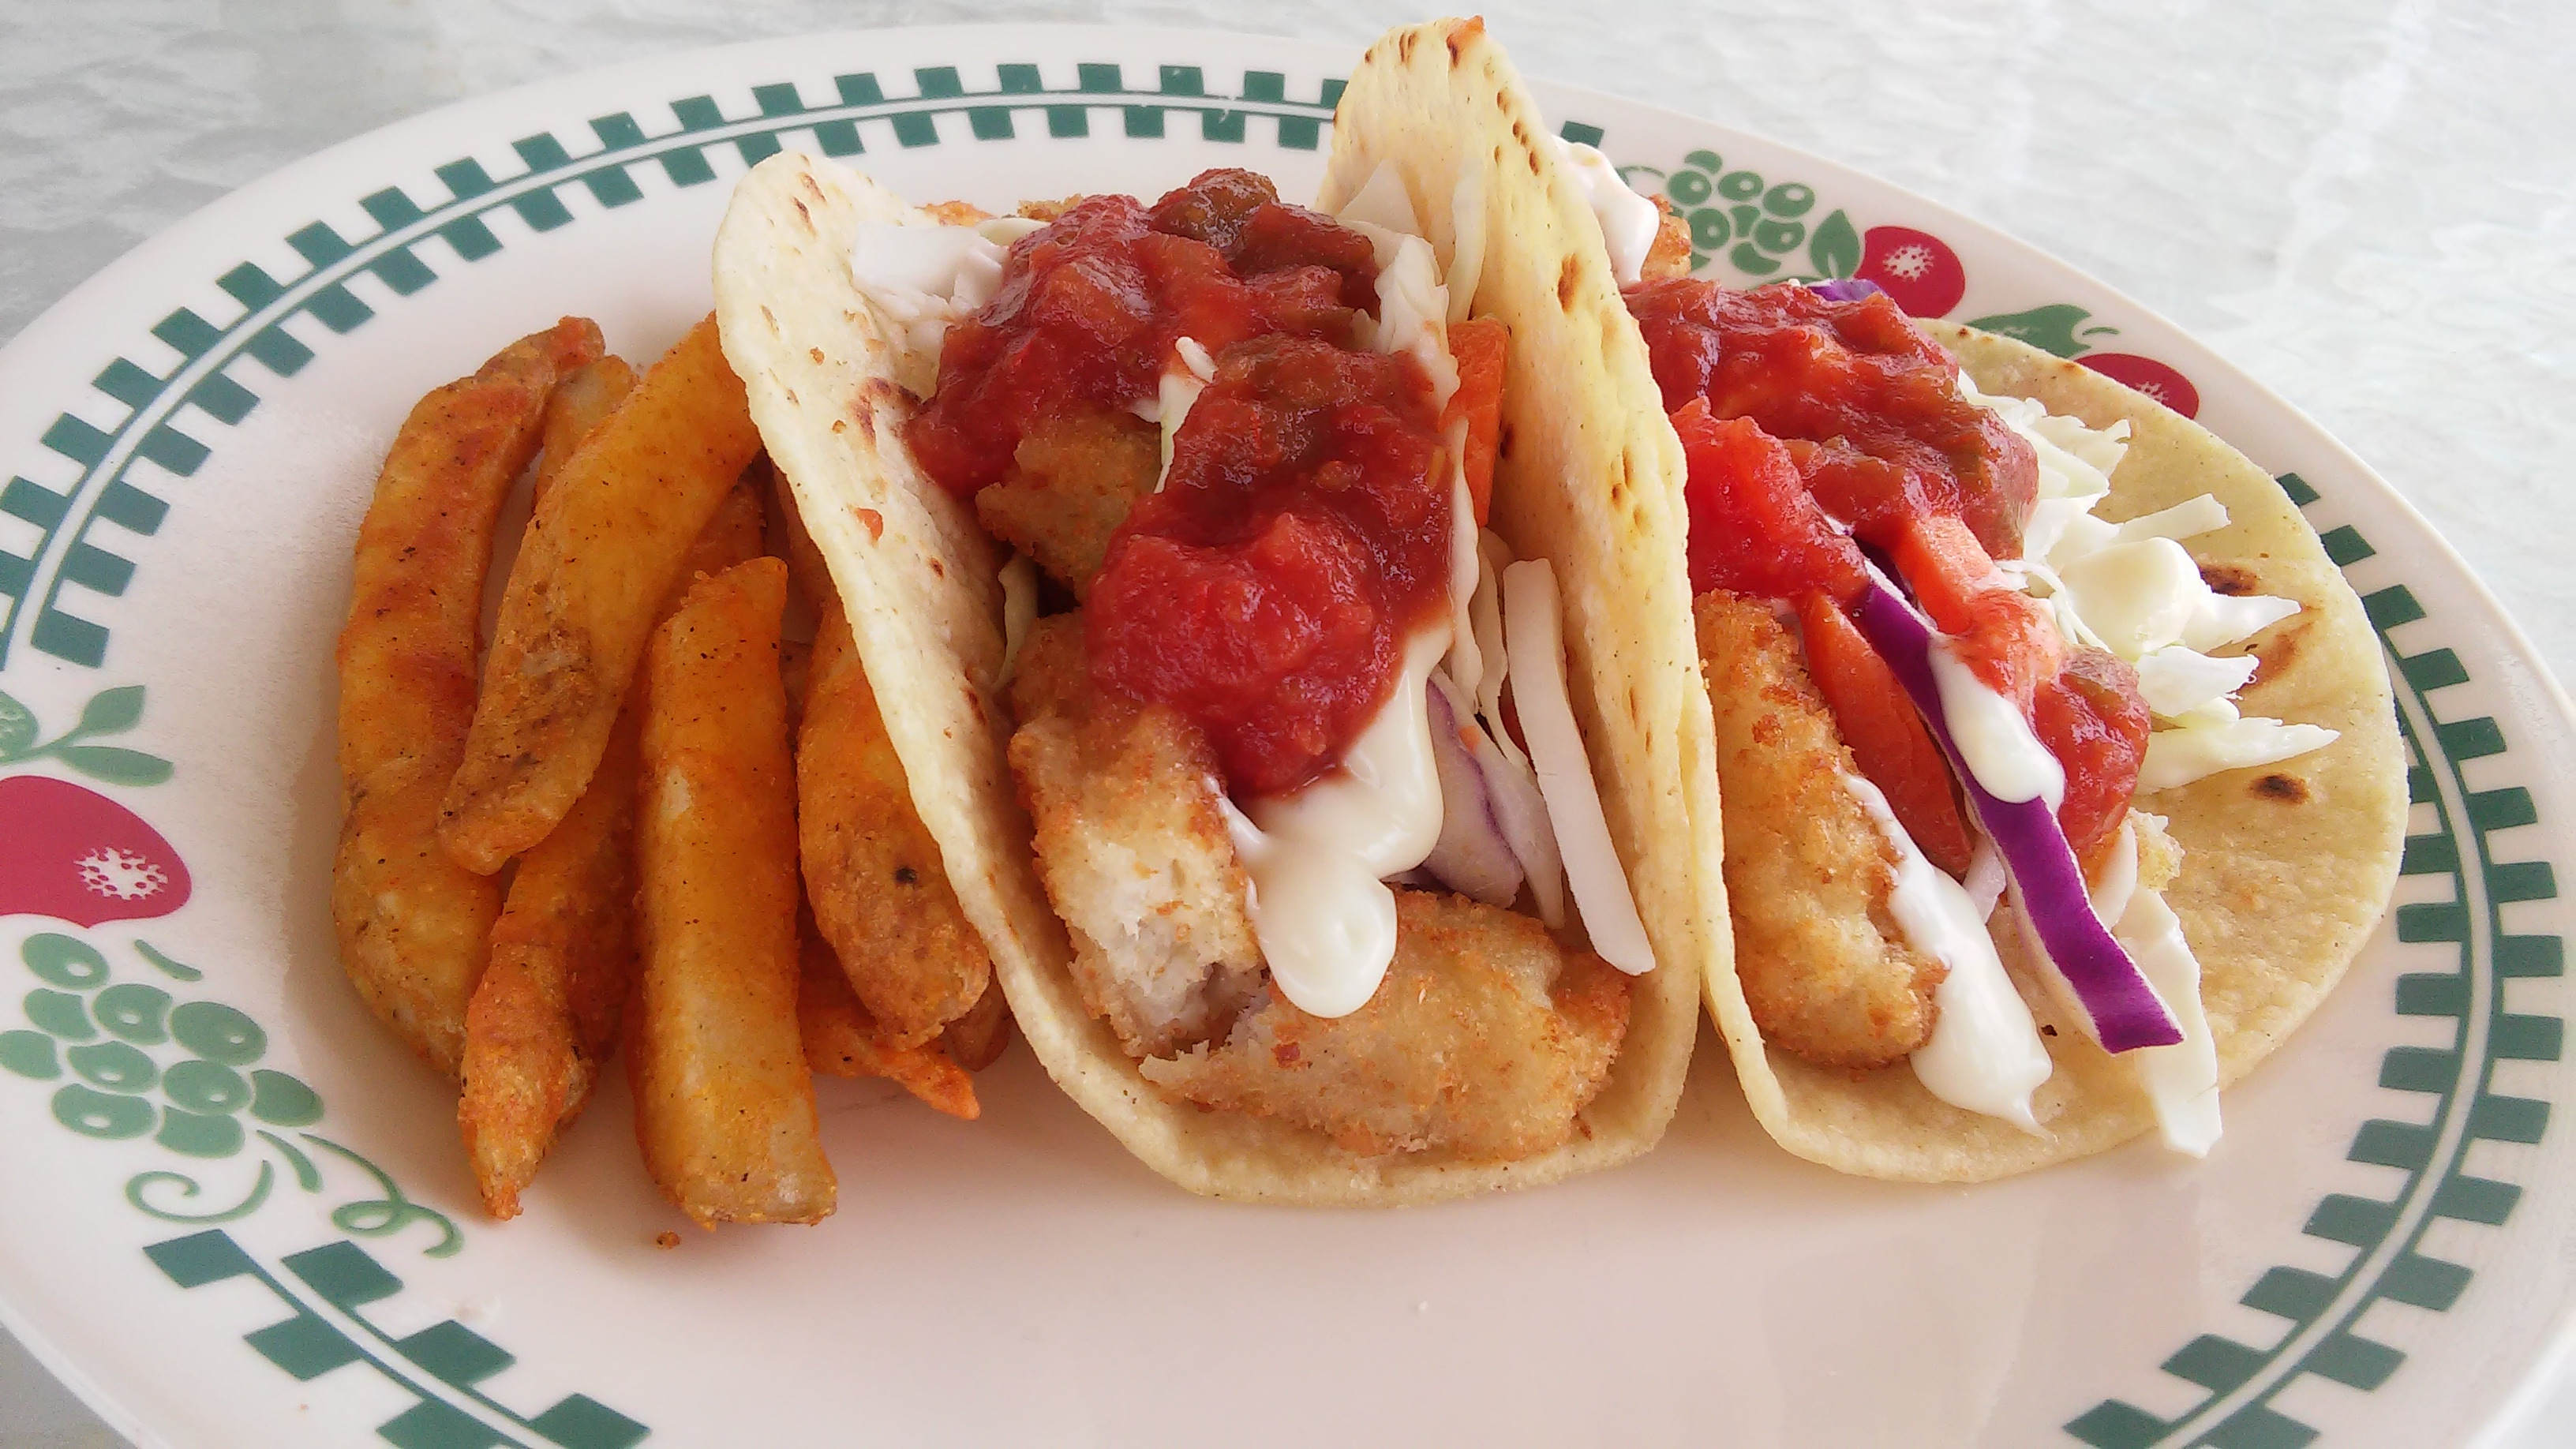 Receita rápida e fácil de tacos de peixe